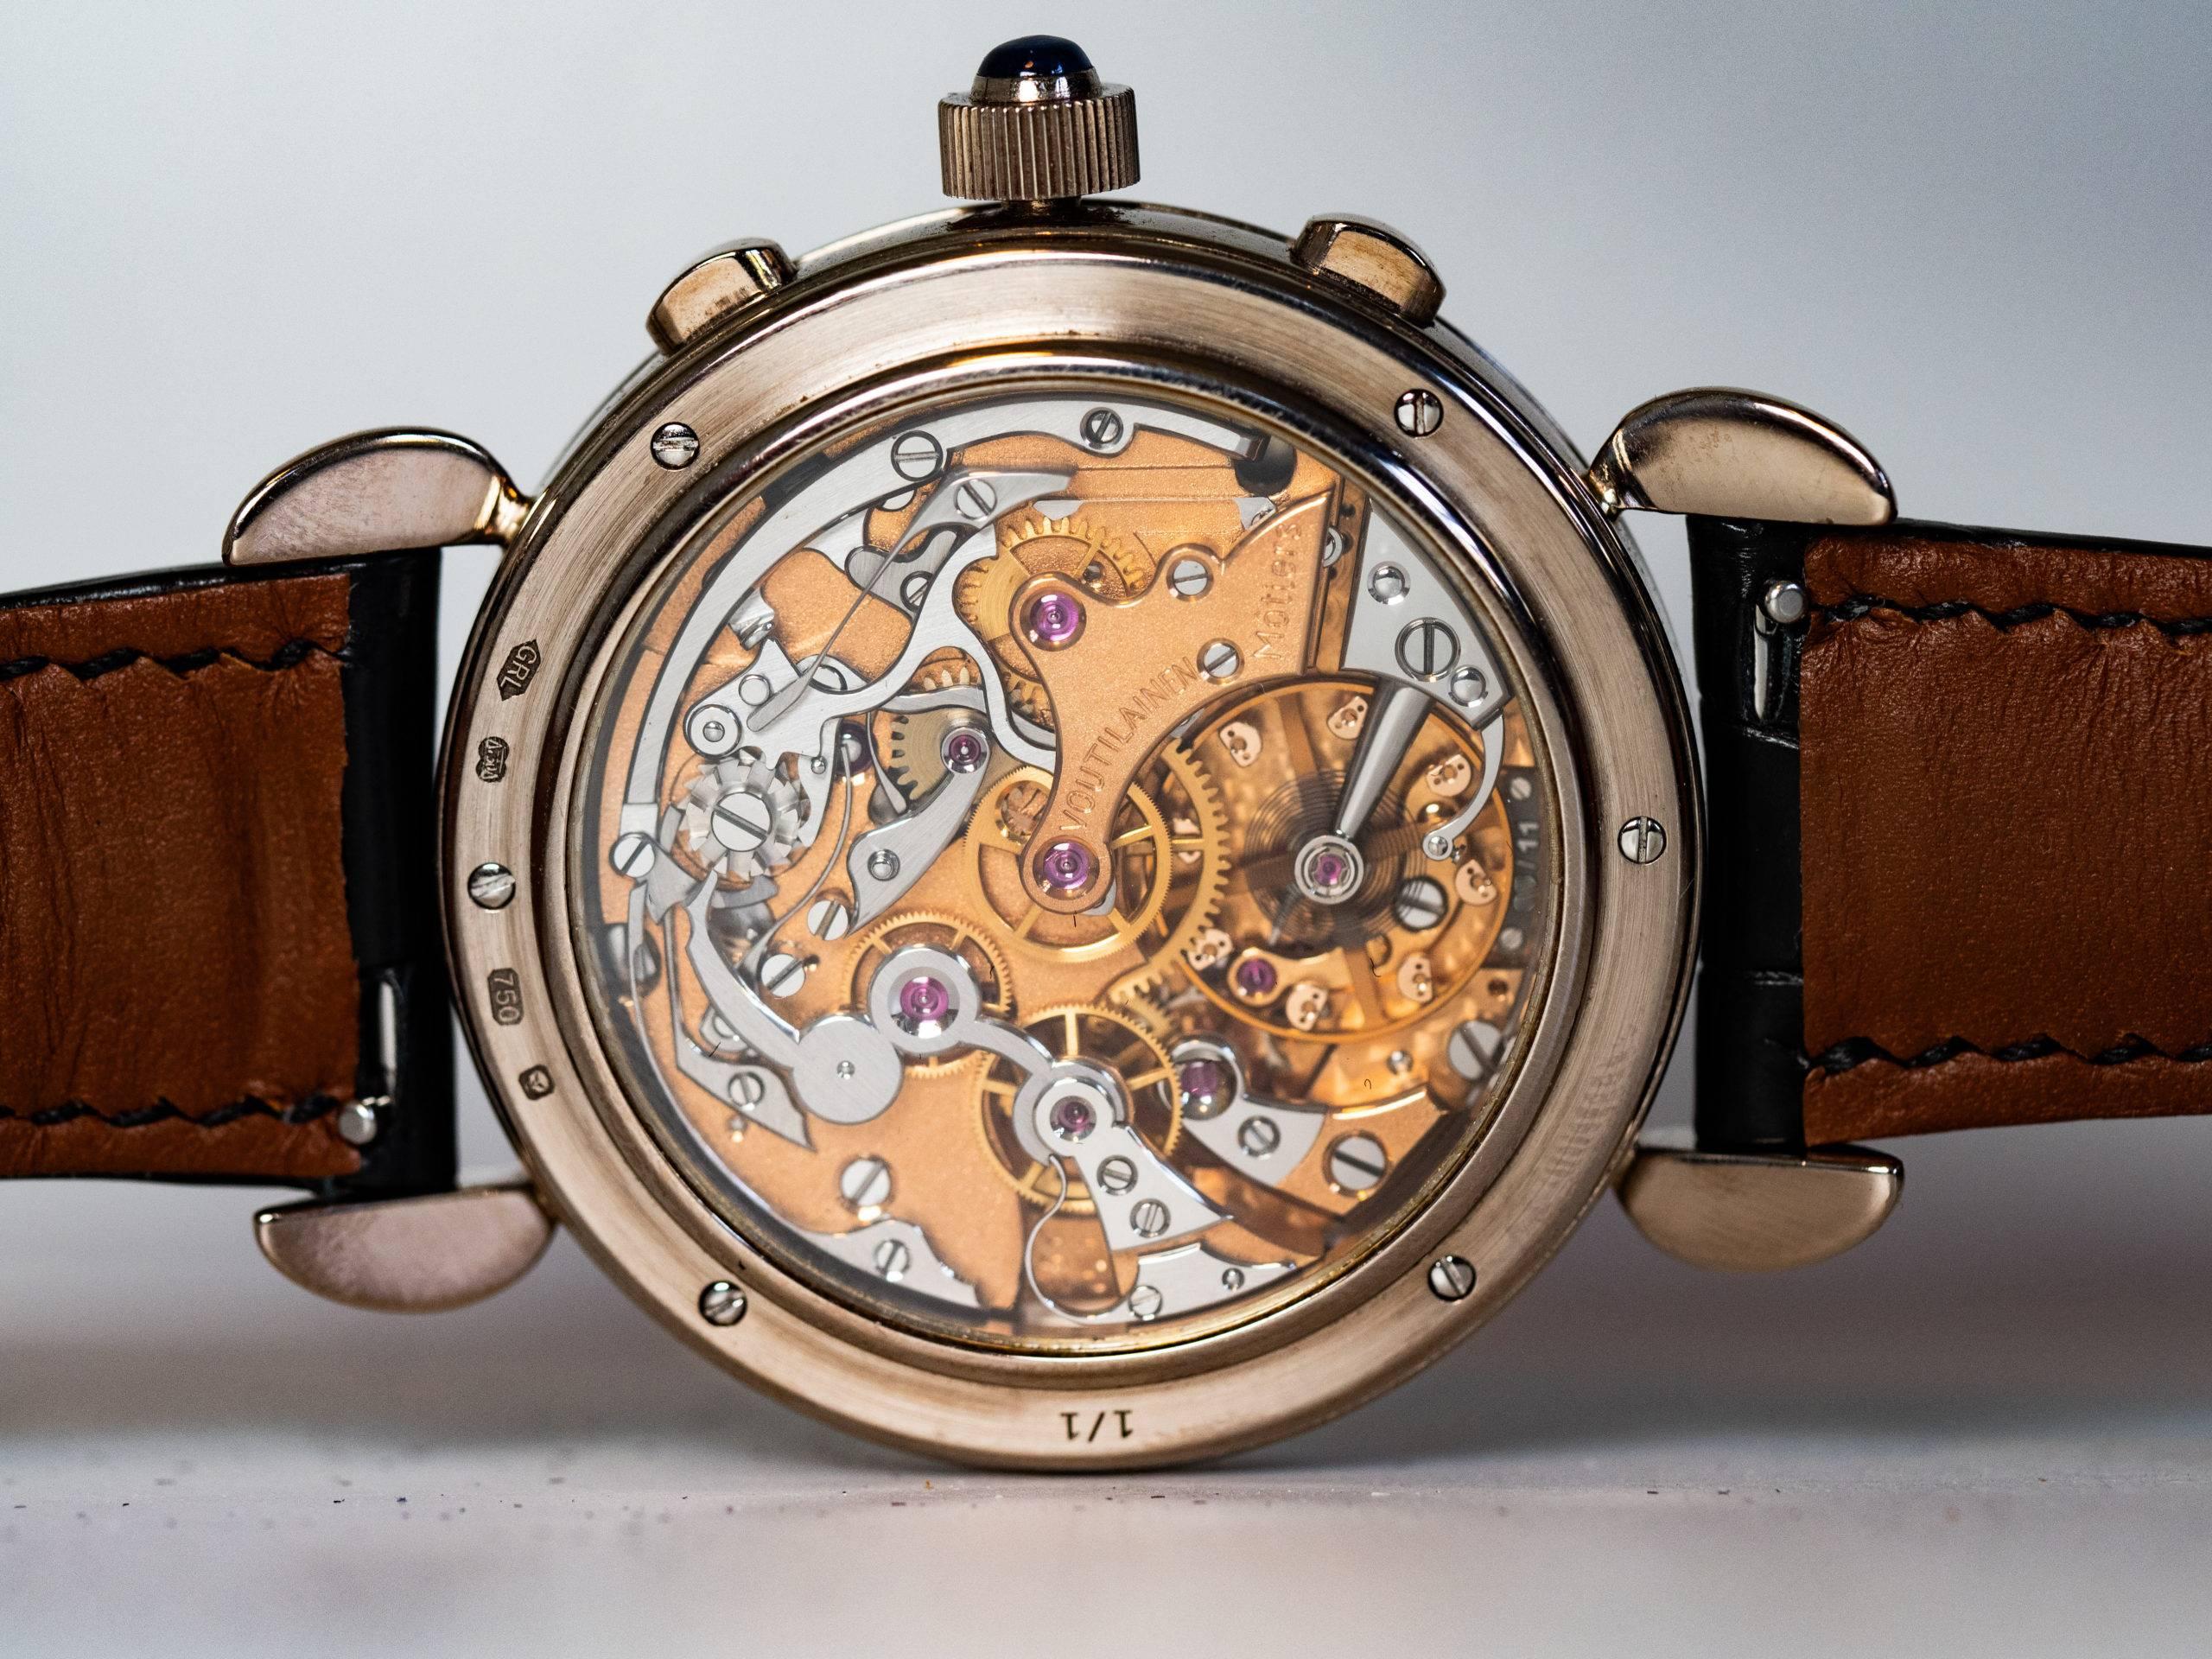 Kari Voutilainen Masterpiece Chronograph Movement